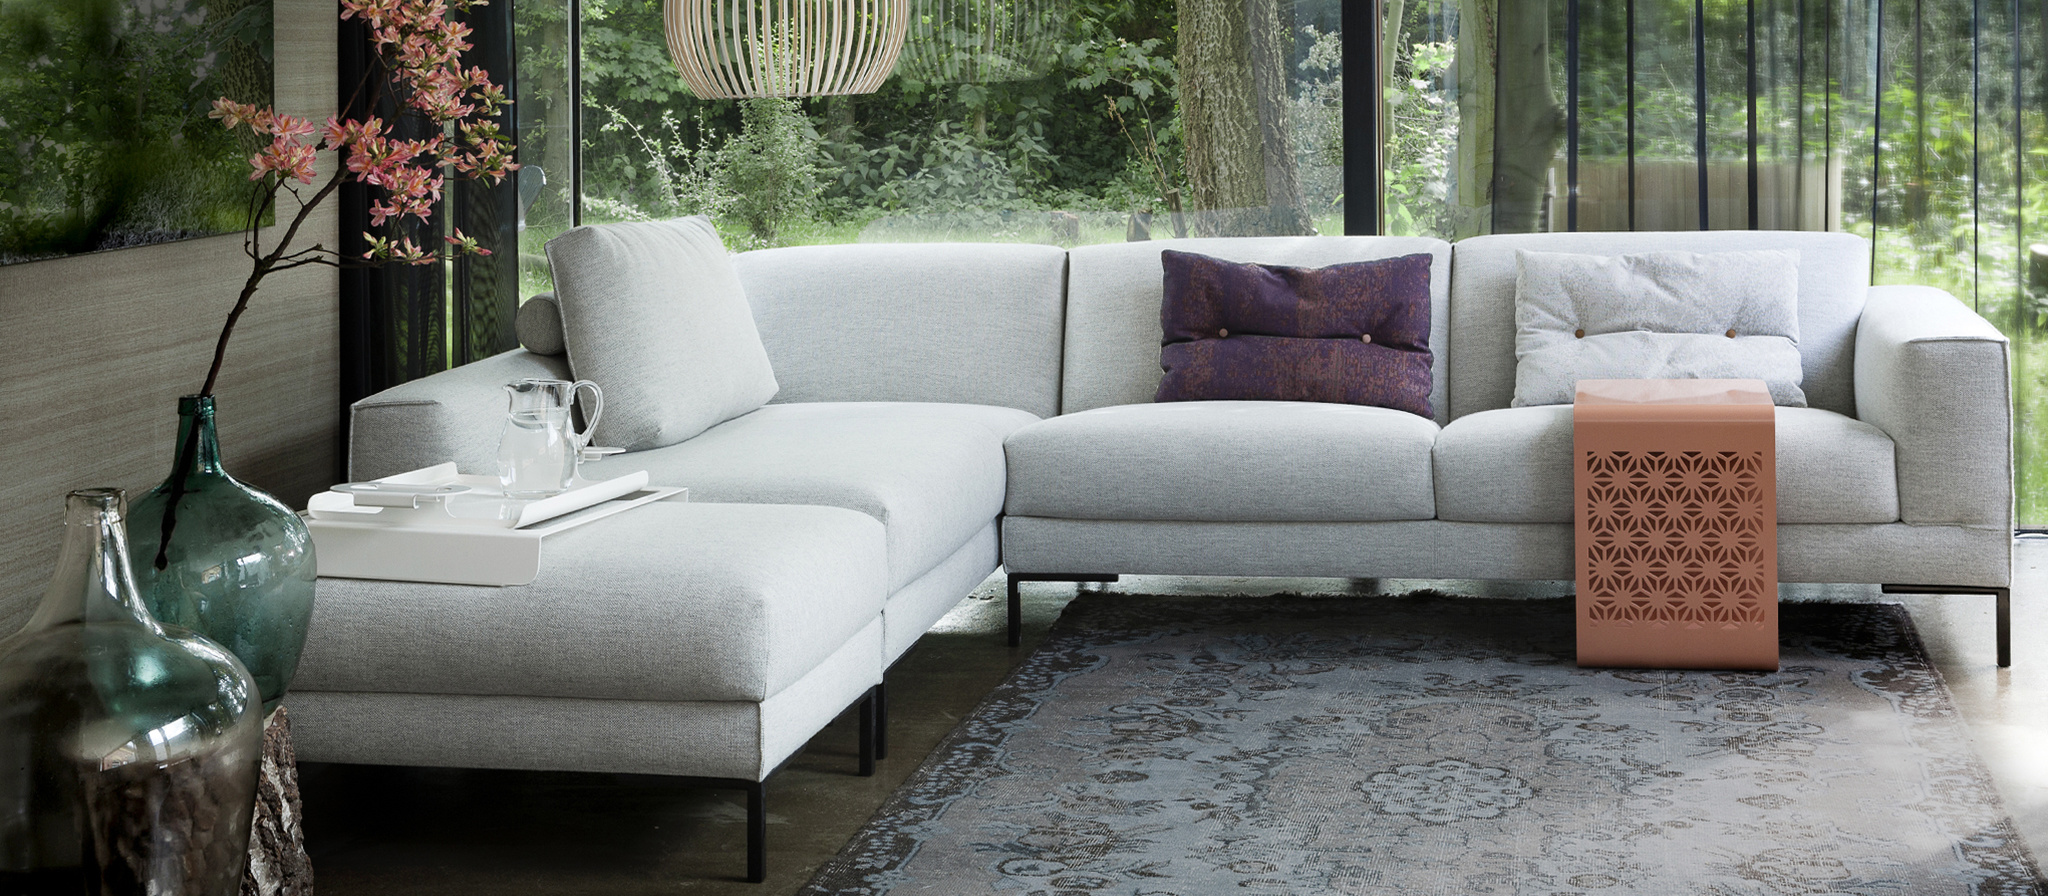 Design On Stock Aikon.Contemporary Sofa Aikon Dutch Modern Sofa Design On Stock Usa